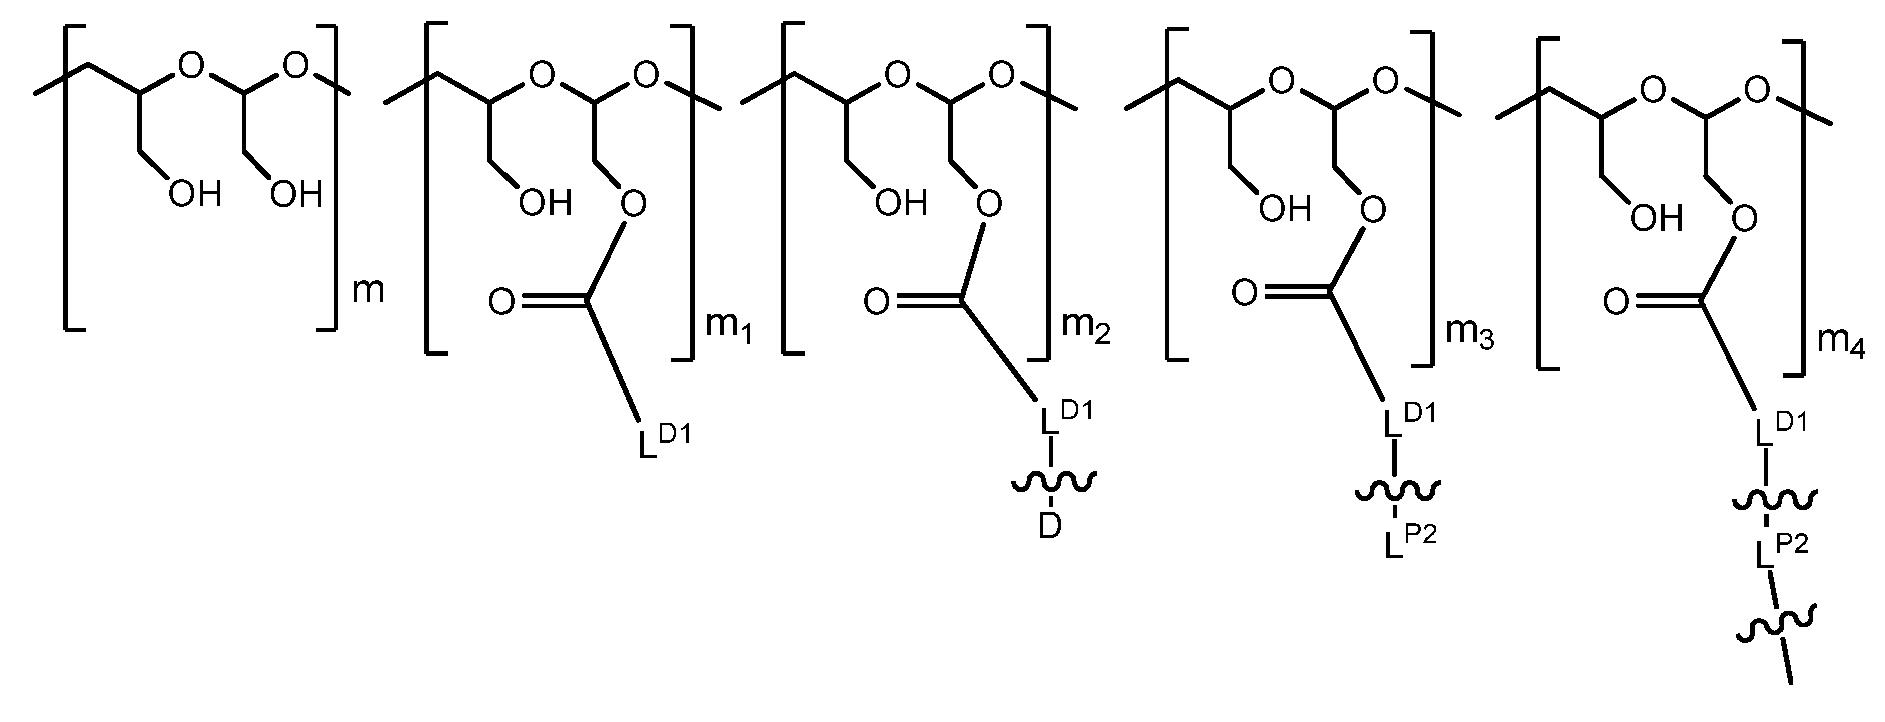 Figure 112014001971018-pct00220